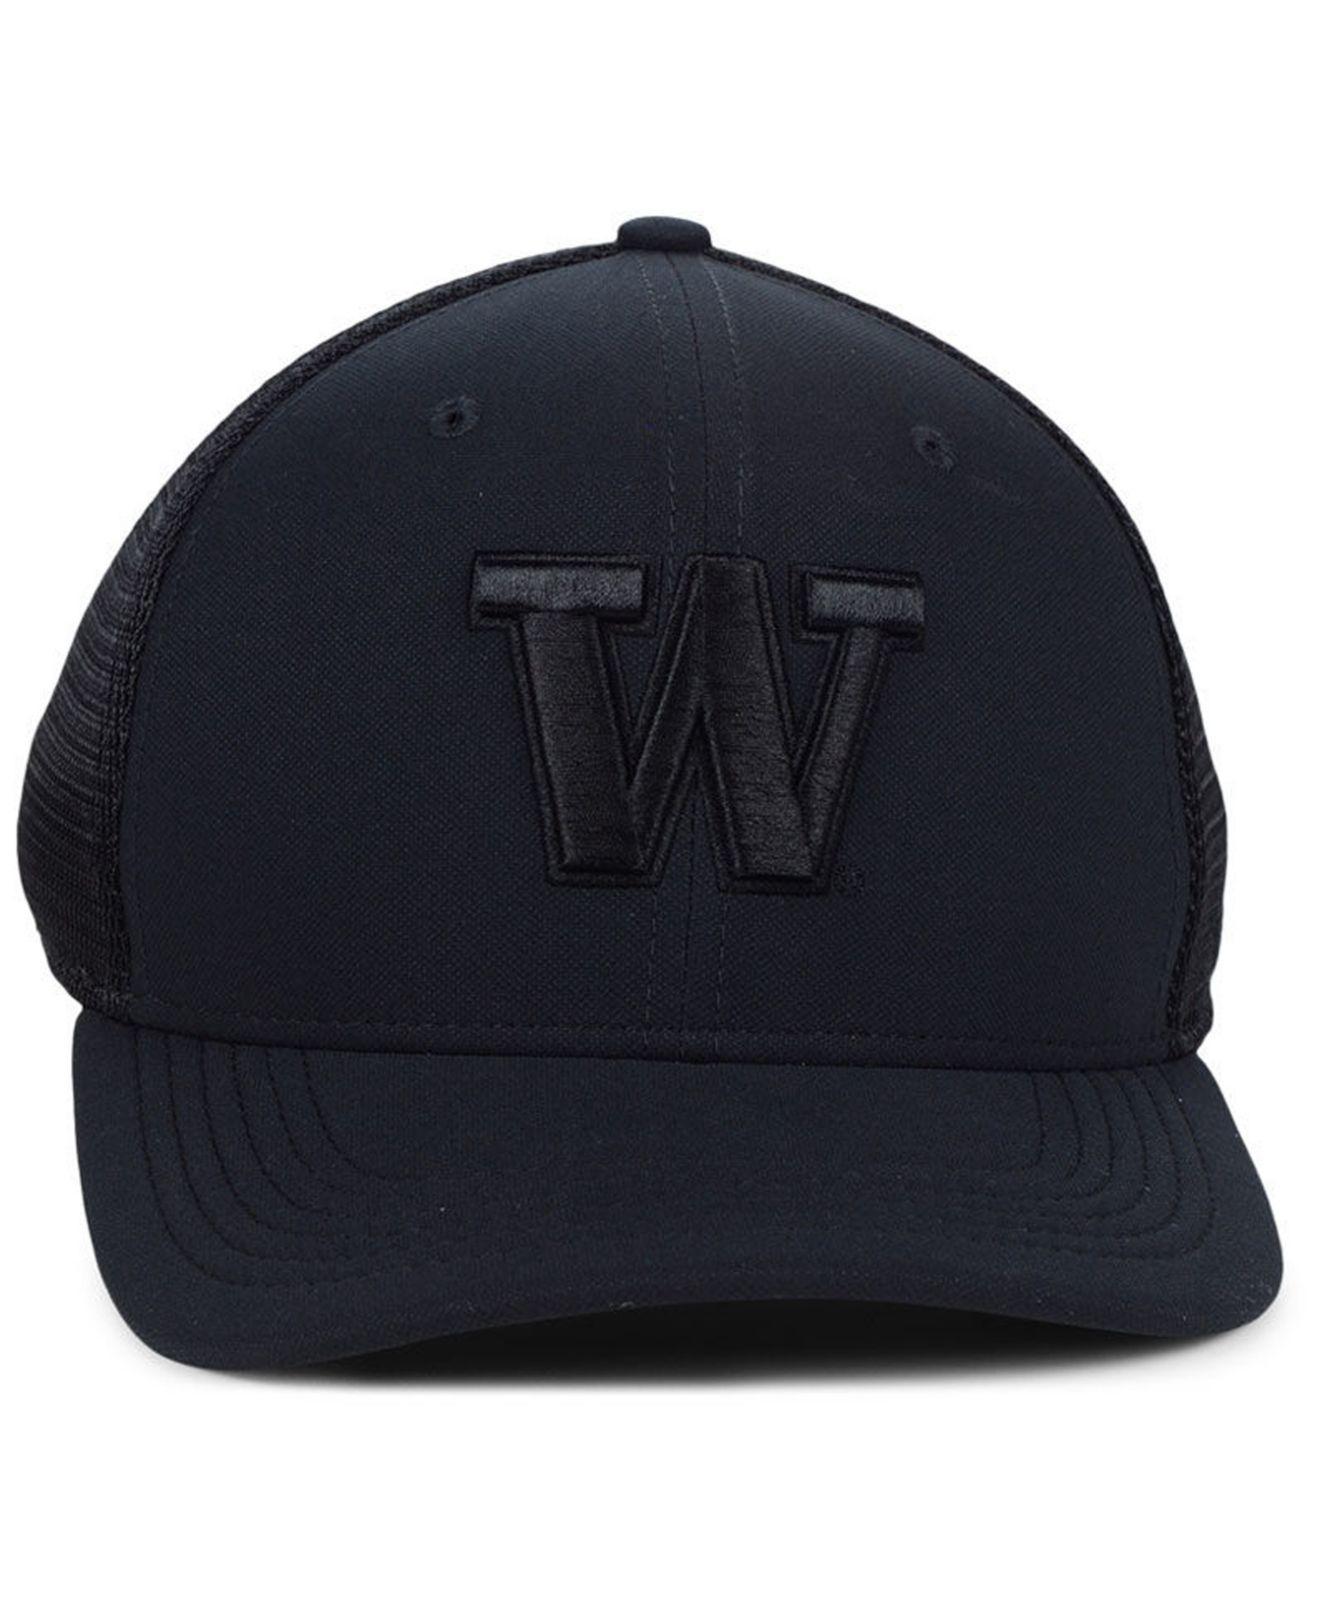 half off 9cc2c ea05f ... cheap lyst nike washington huskies aerobill black swoosh cap in black  for men fd74a 2b978